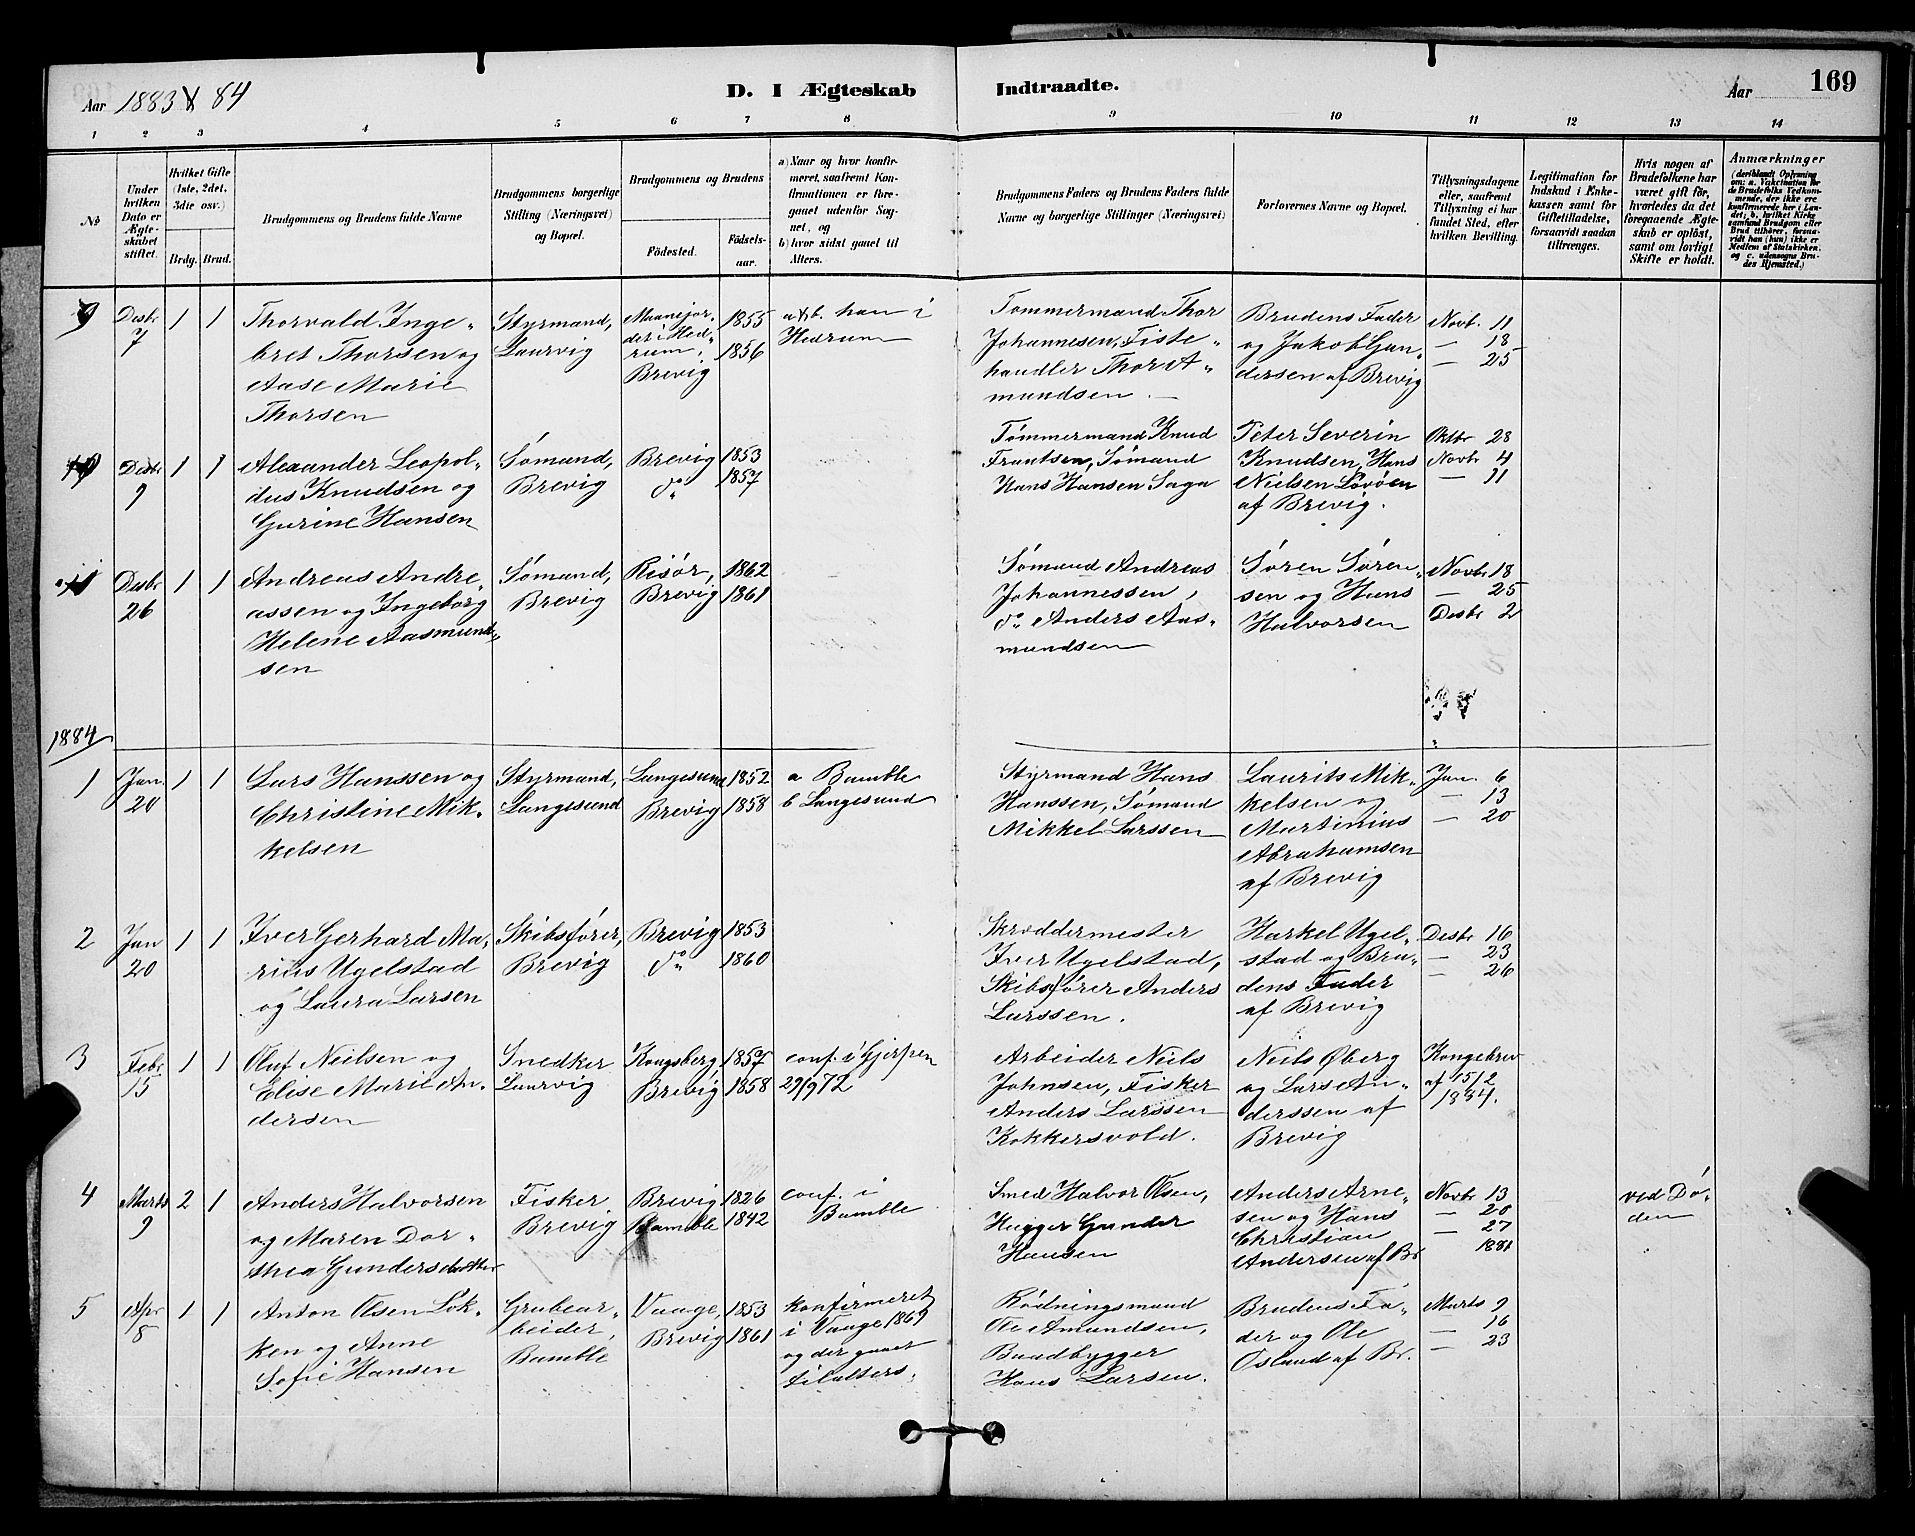 SAKO, Brevik kirkebøker, G/Ga/L0004: Klokkerbok nr. 4, 1882-1900, s. 169